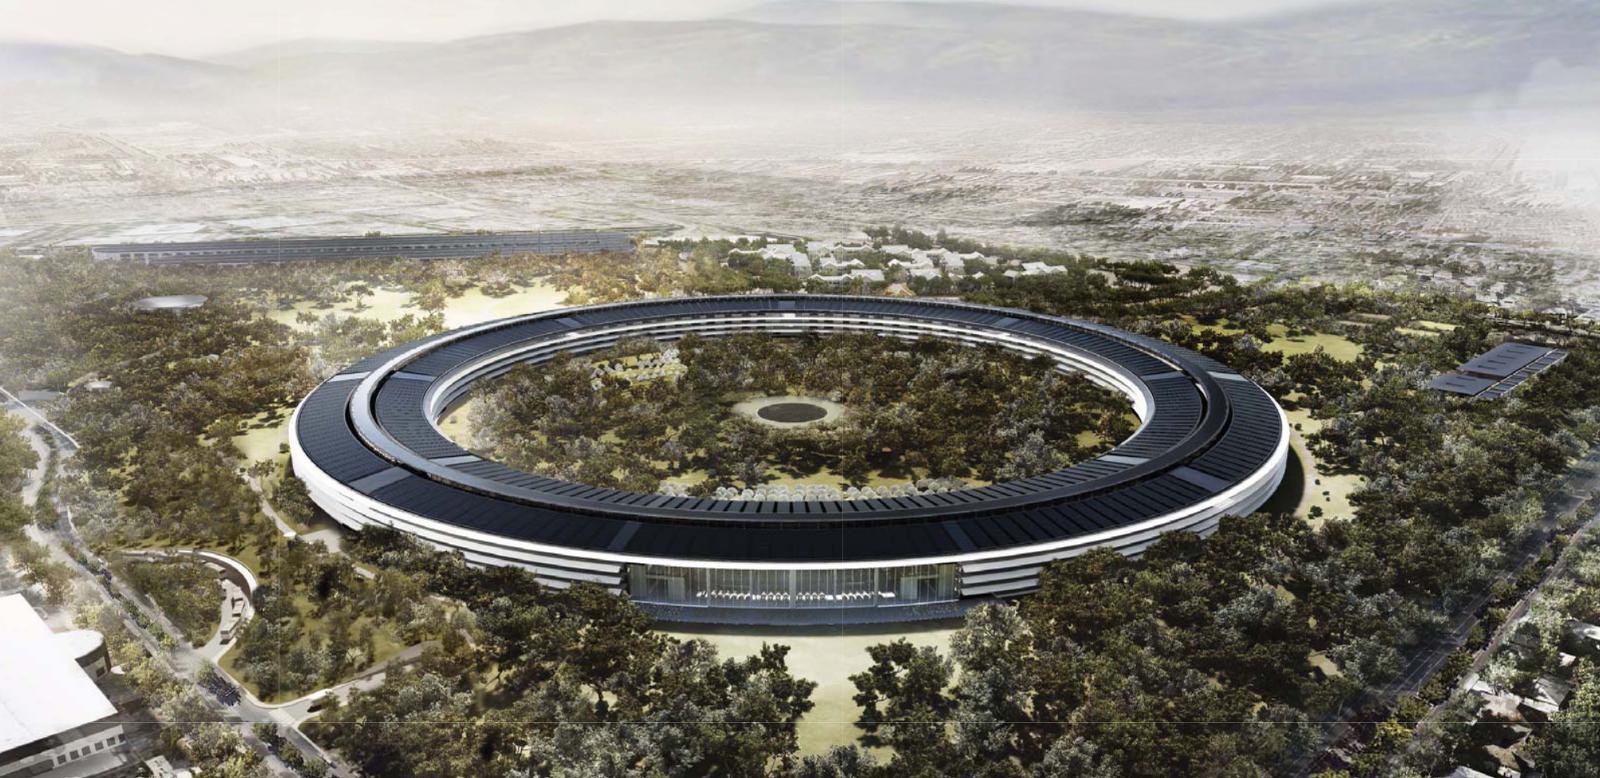 Proposed new Apple campus in Cupertino, California